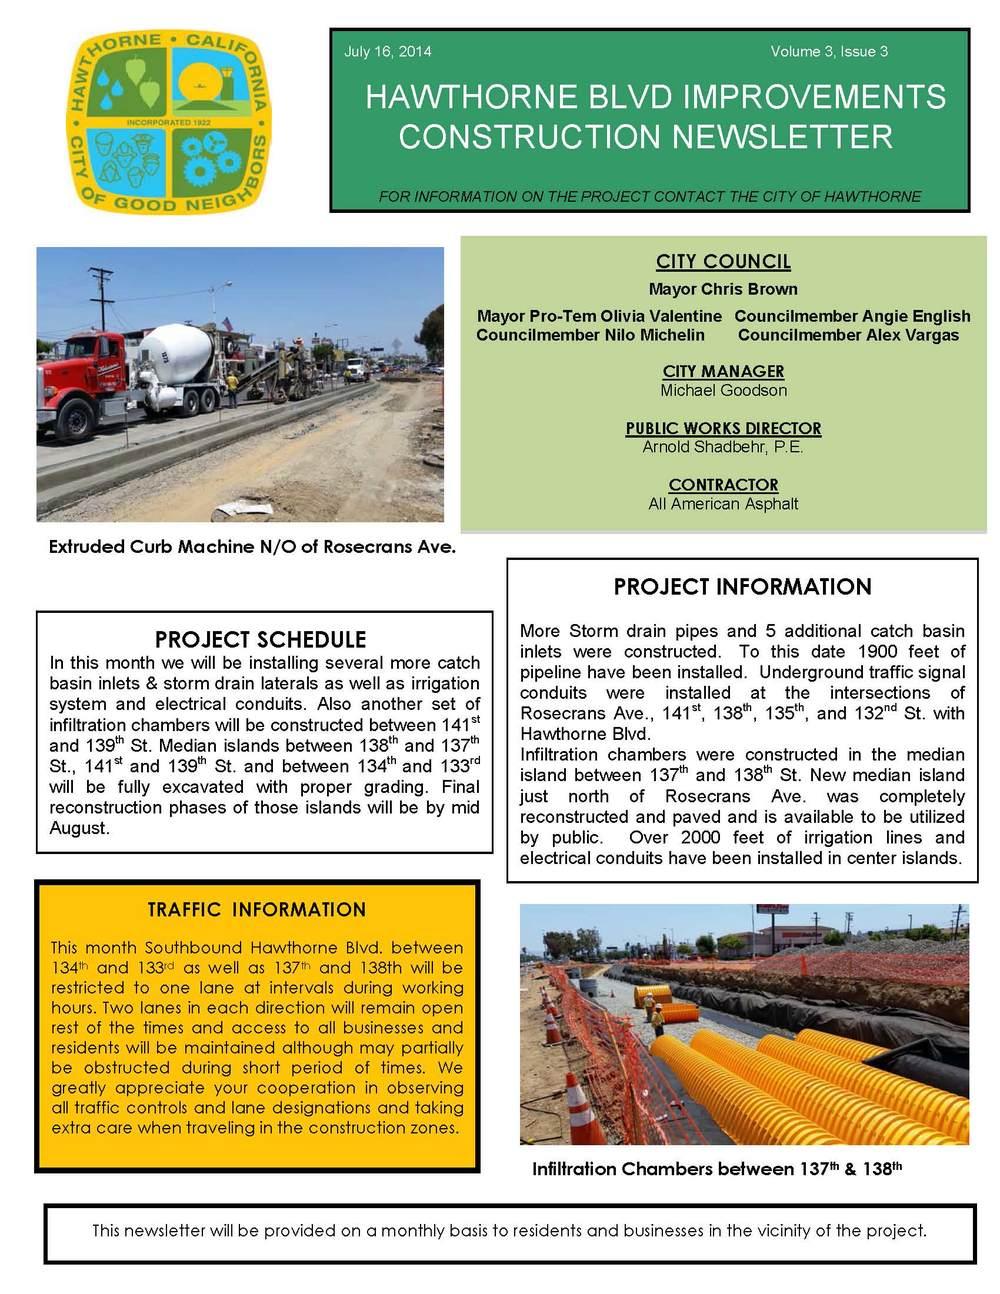 Hawthorne Blvd Improvements Newsletter July 2014